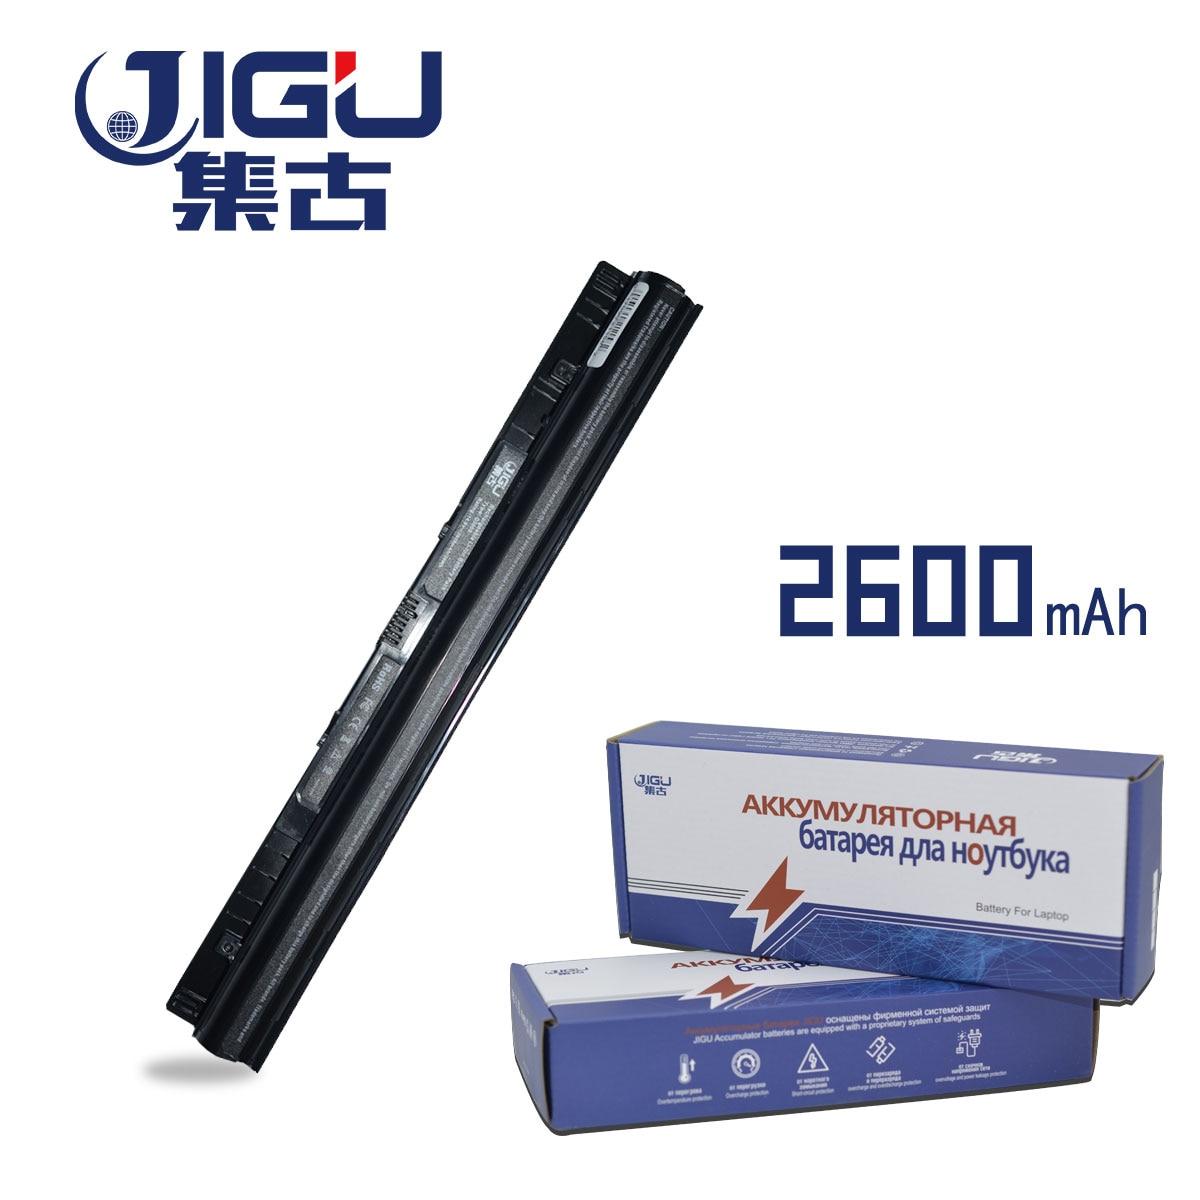 JIGU Laptop Battery For Lenovo G400s G500s S410p G510s G410s G405s G505s S510p L12L4A02 L12L4E01 L12M4A02 L12M4A02 L12S4A02 new original l12l4e01 laptop battery for lenovo g400s g405s g410s g500s g505s g510s s410p s510p z710 l12s4a02 l12m4e01 l12s4e01